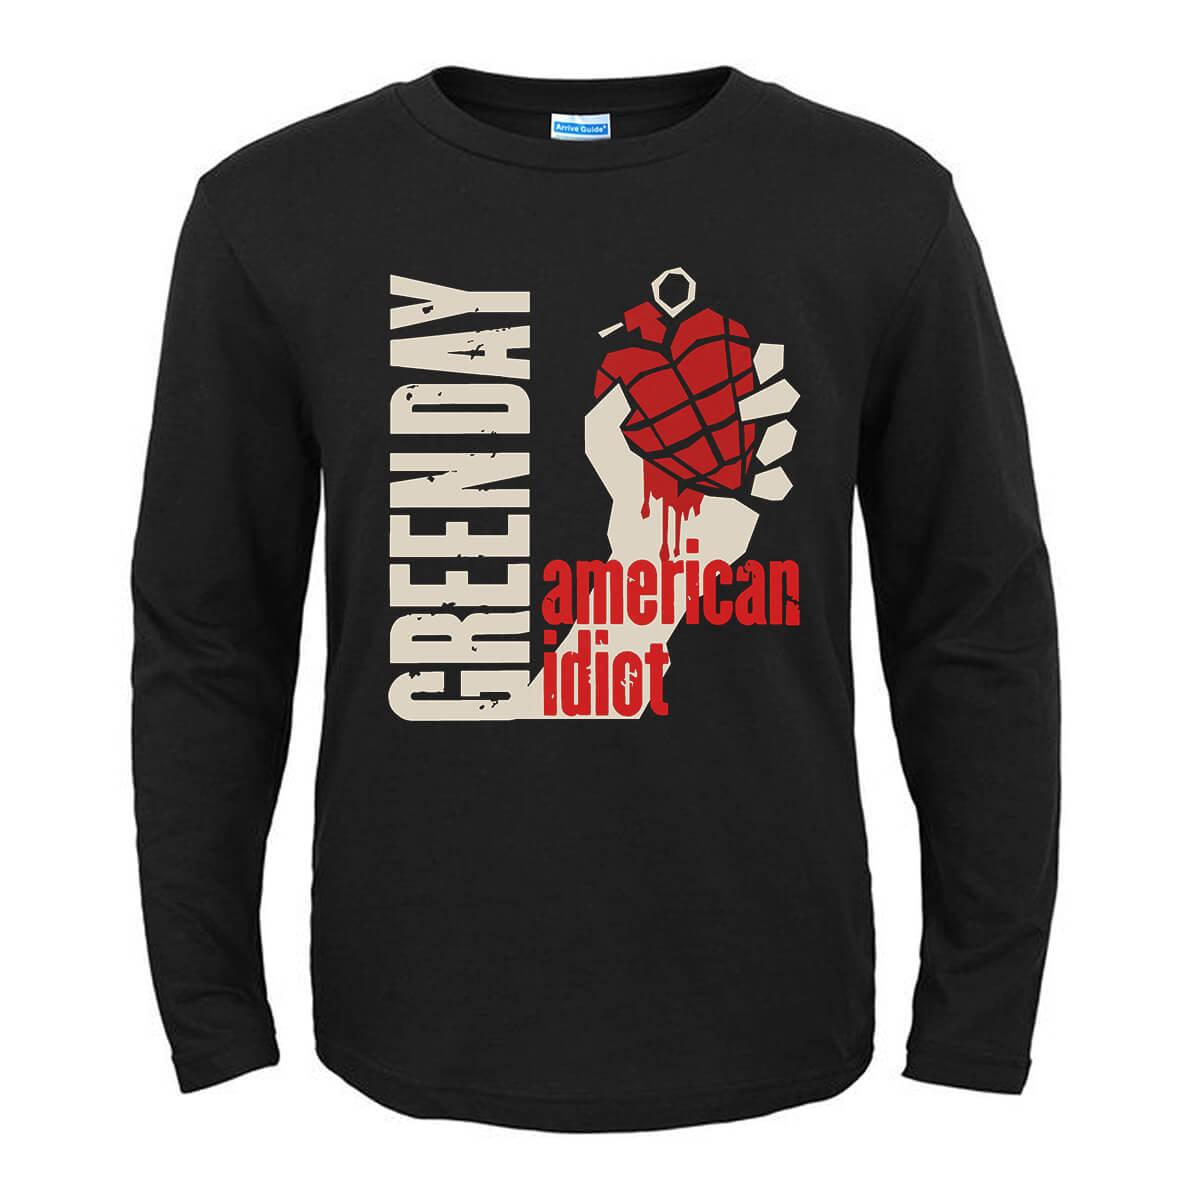 Green Day Punk Rock Band Graphic T-Shirts